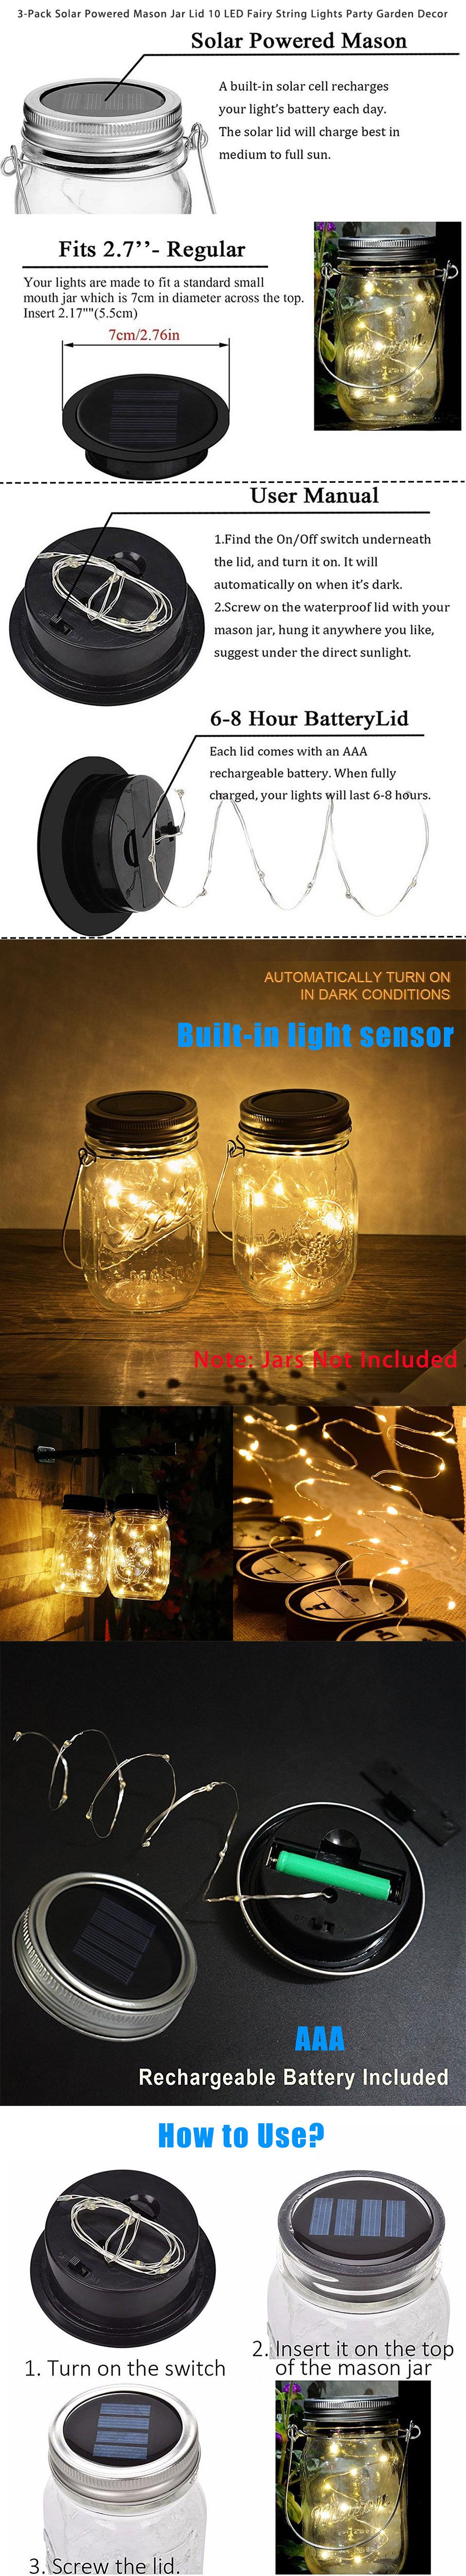 3 Piece 12V Solar Powered 1M String Fairy Lights Lids Insert Lamp For Mason Jar